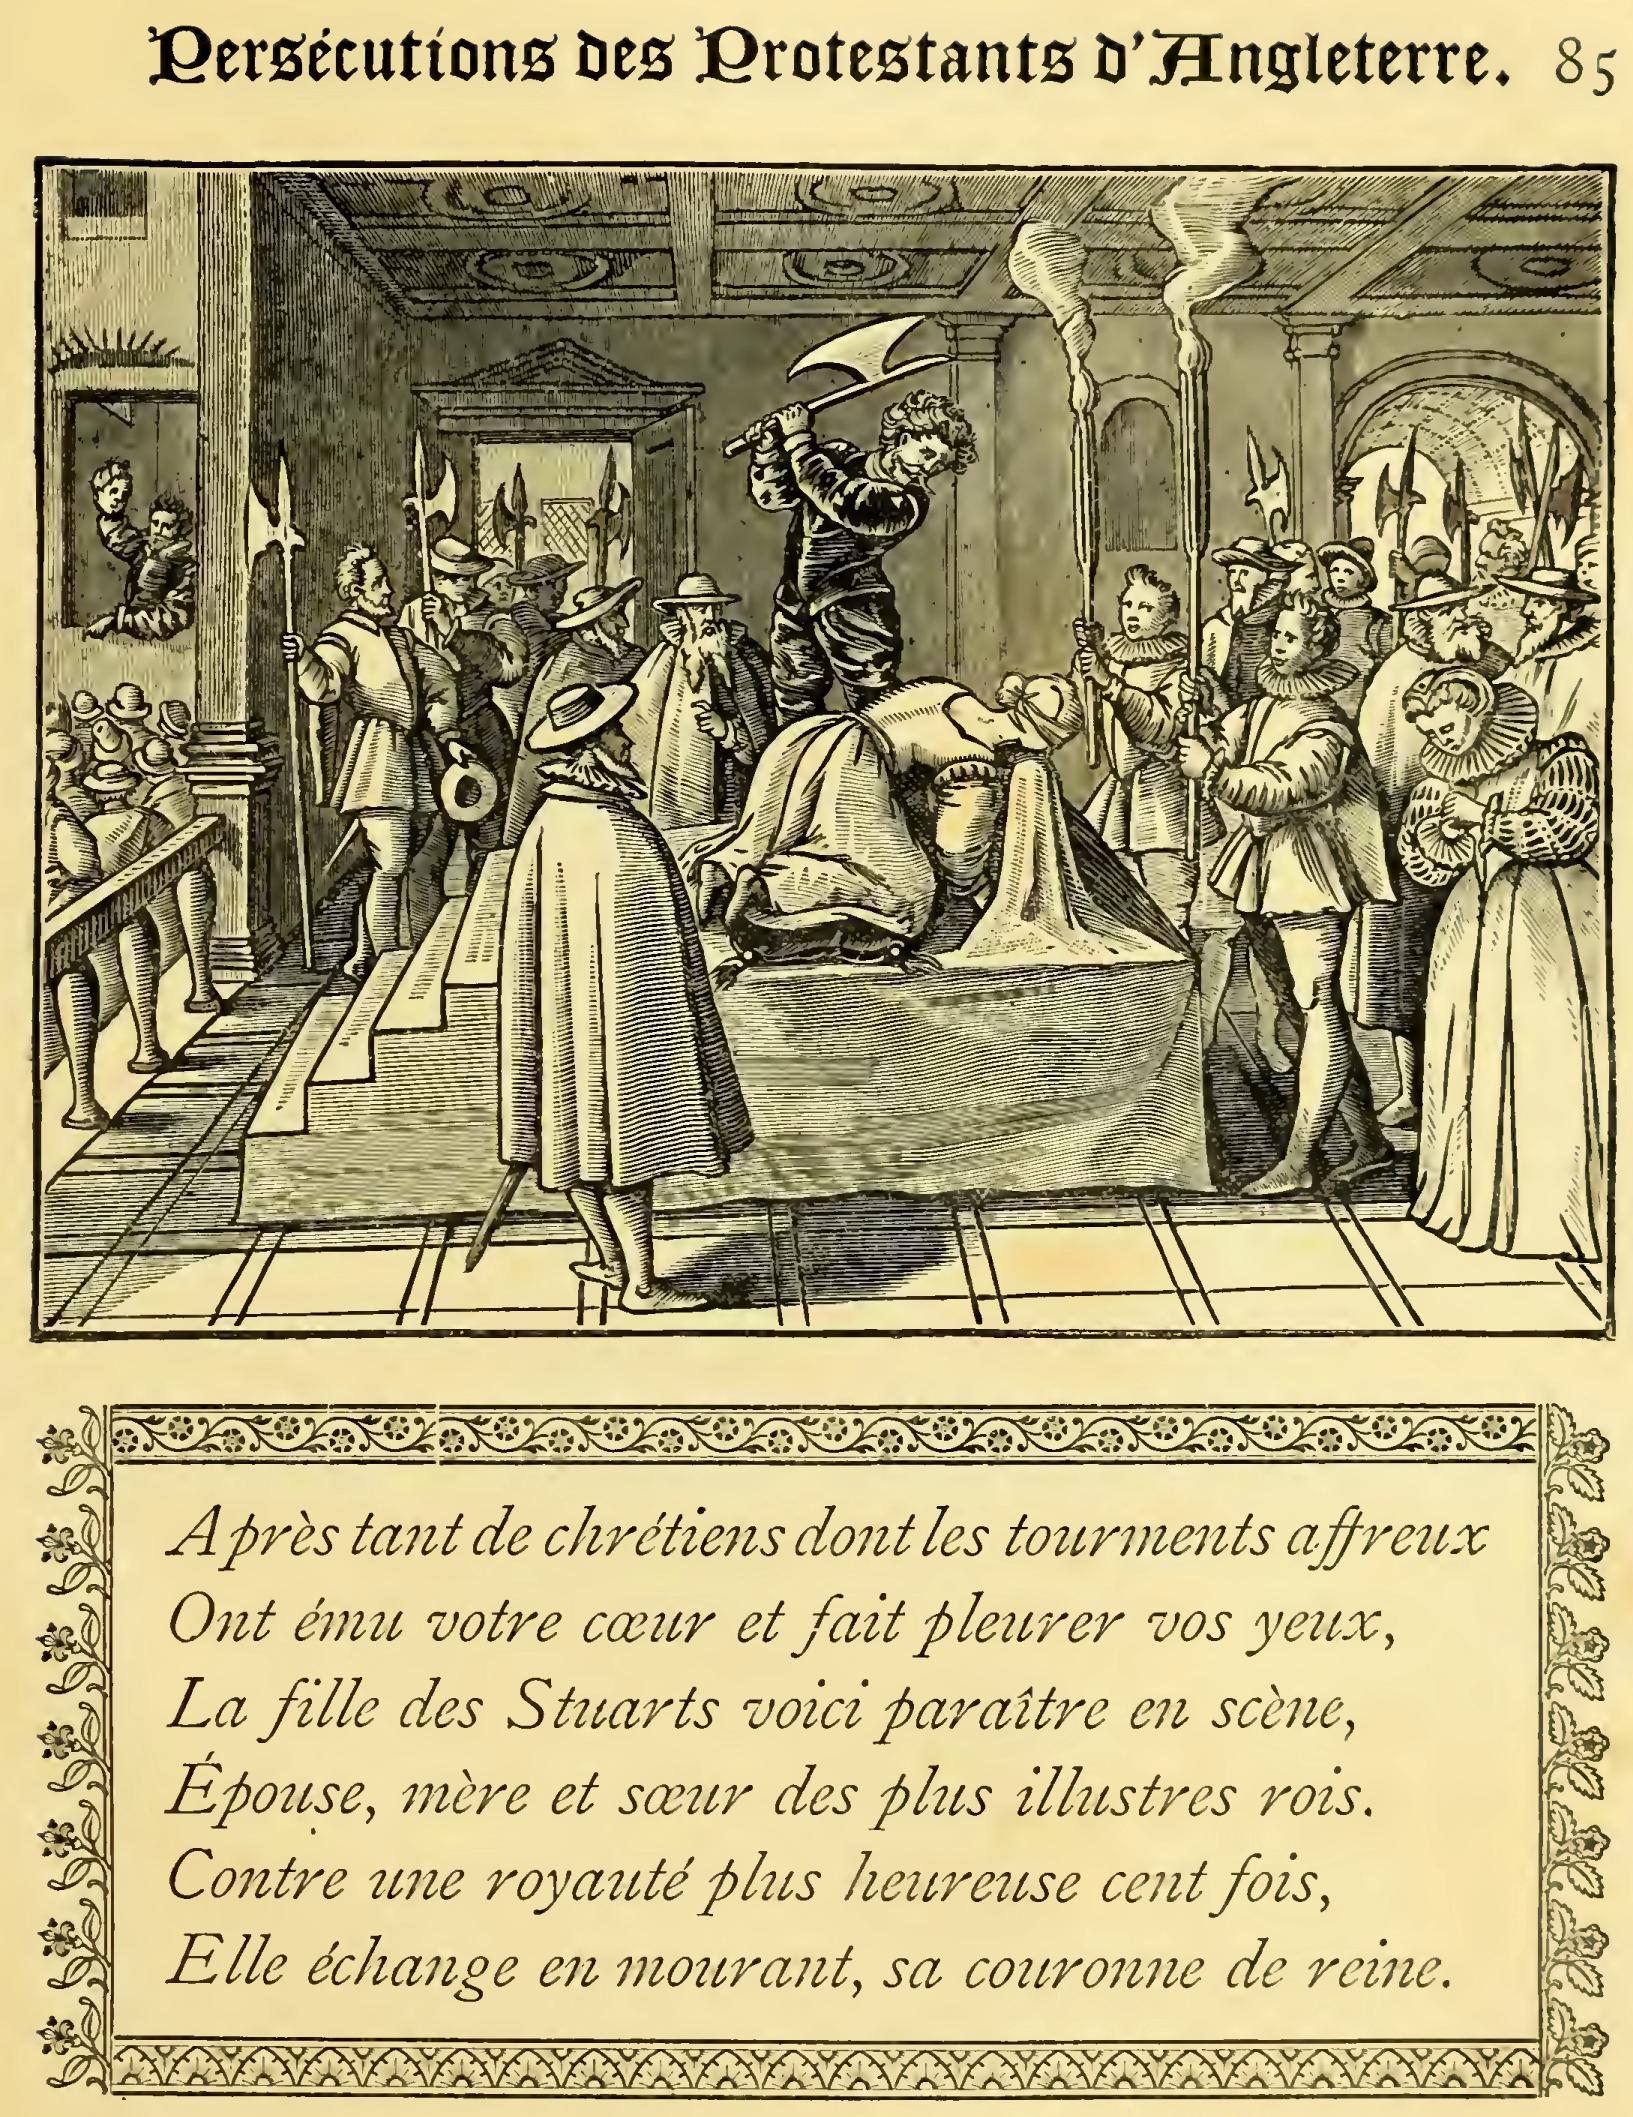 Filethéâtre Des Cruautés Persécutions Des Protestants D